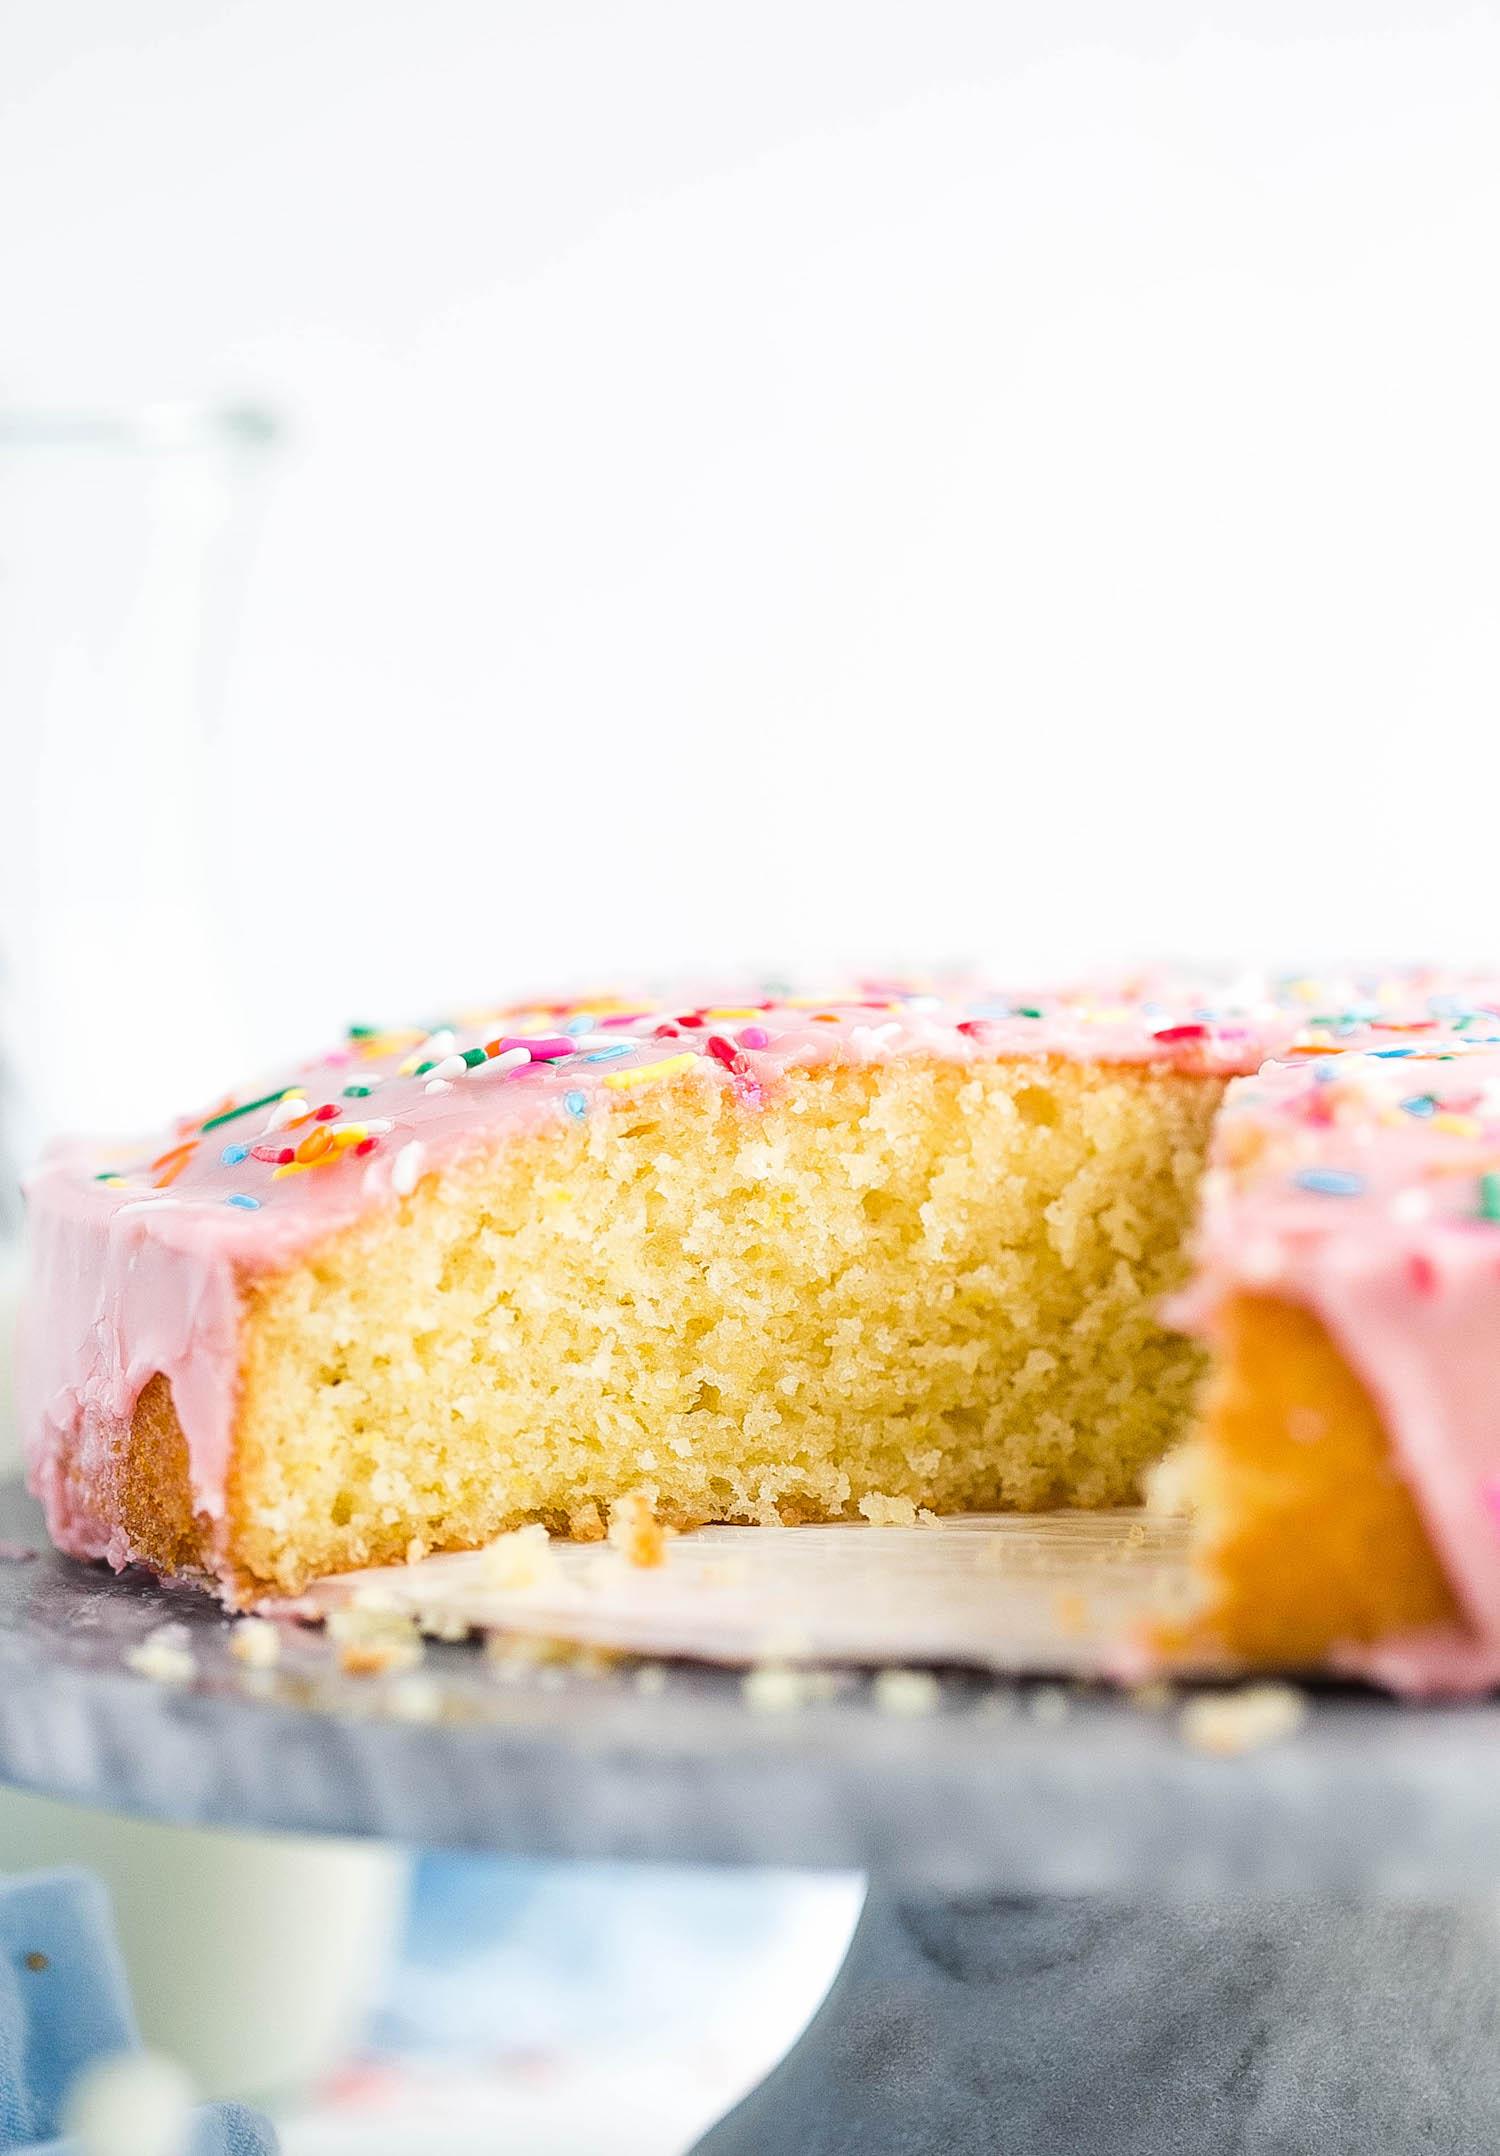 basic glazed vanilla cake 10.jpgBasic Glazed Vanilla Cake: soft, fluffy, moist, dairy-free vanilla round cake with a classic vanilla glaze. Quick and easy! | TrufflesandTrends.com